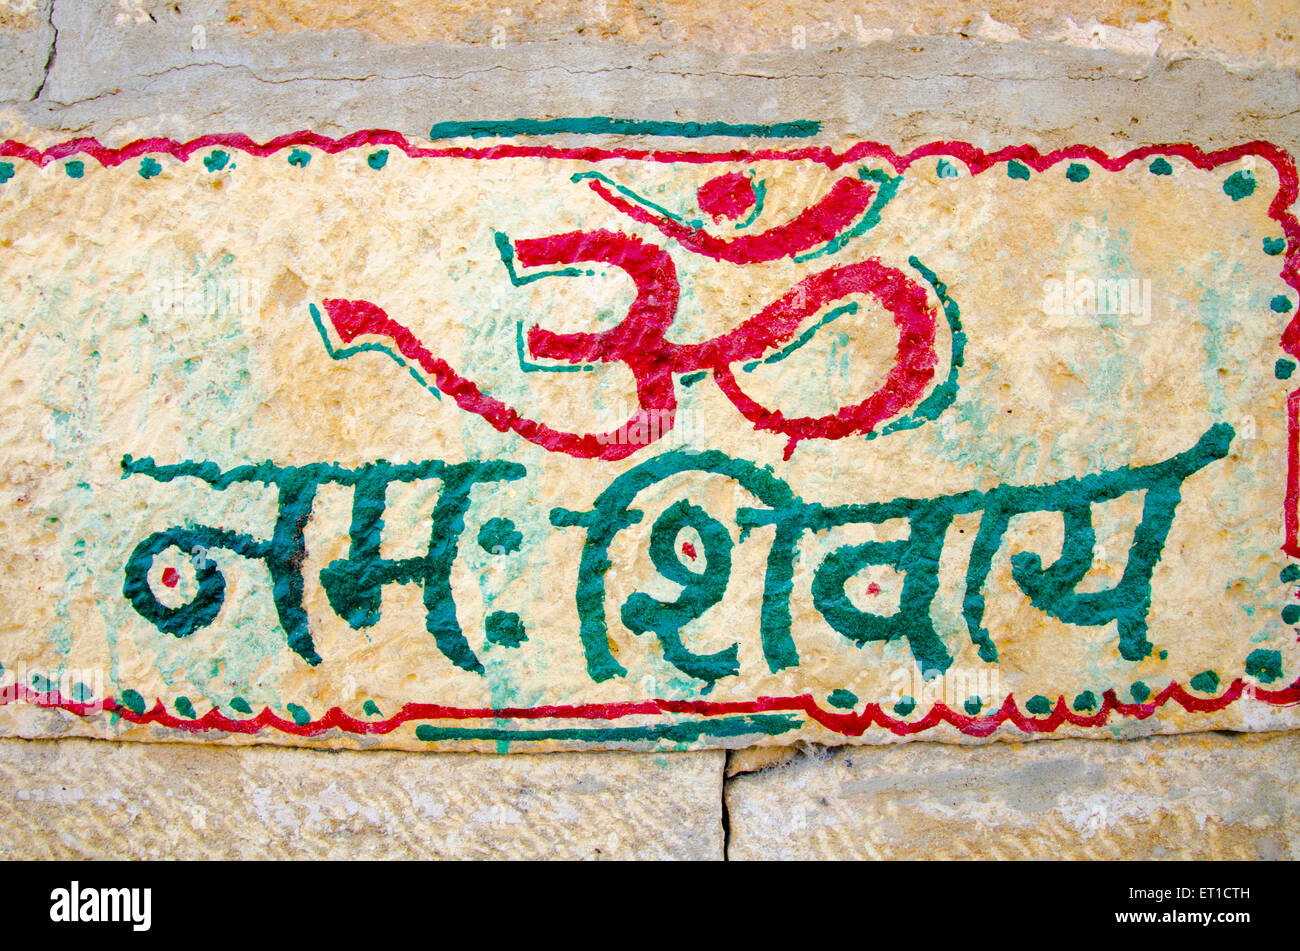 Om Namah Shivay Written on Wall Jaisalmer Rajasthan India Asia - Stock Image